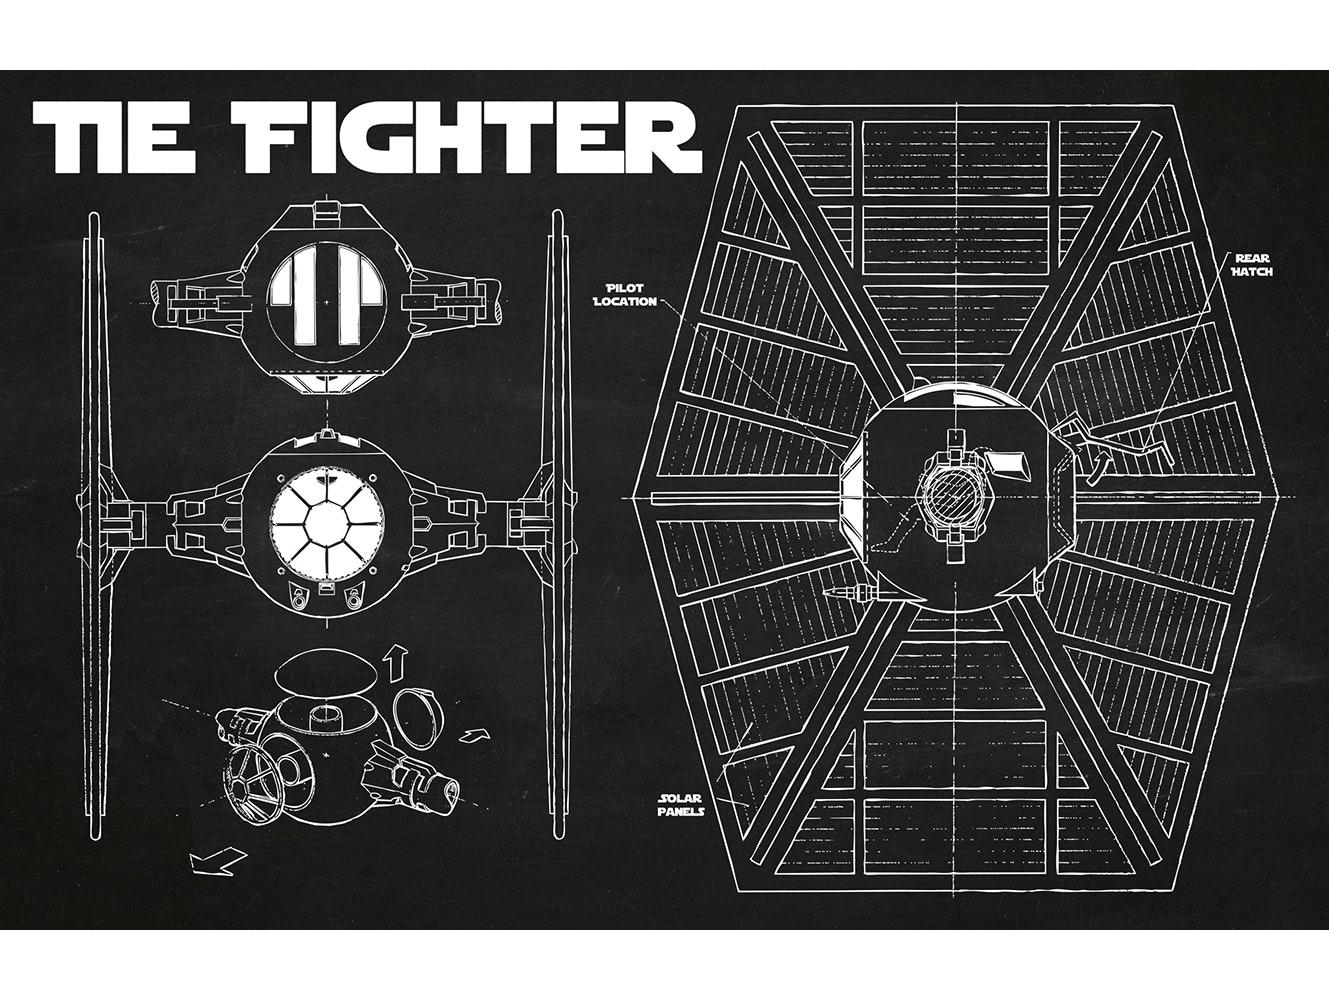 Stary Wars - Tie Fighter (Horizontal Print)